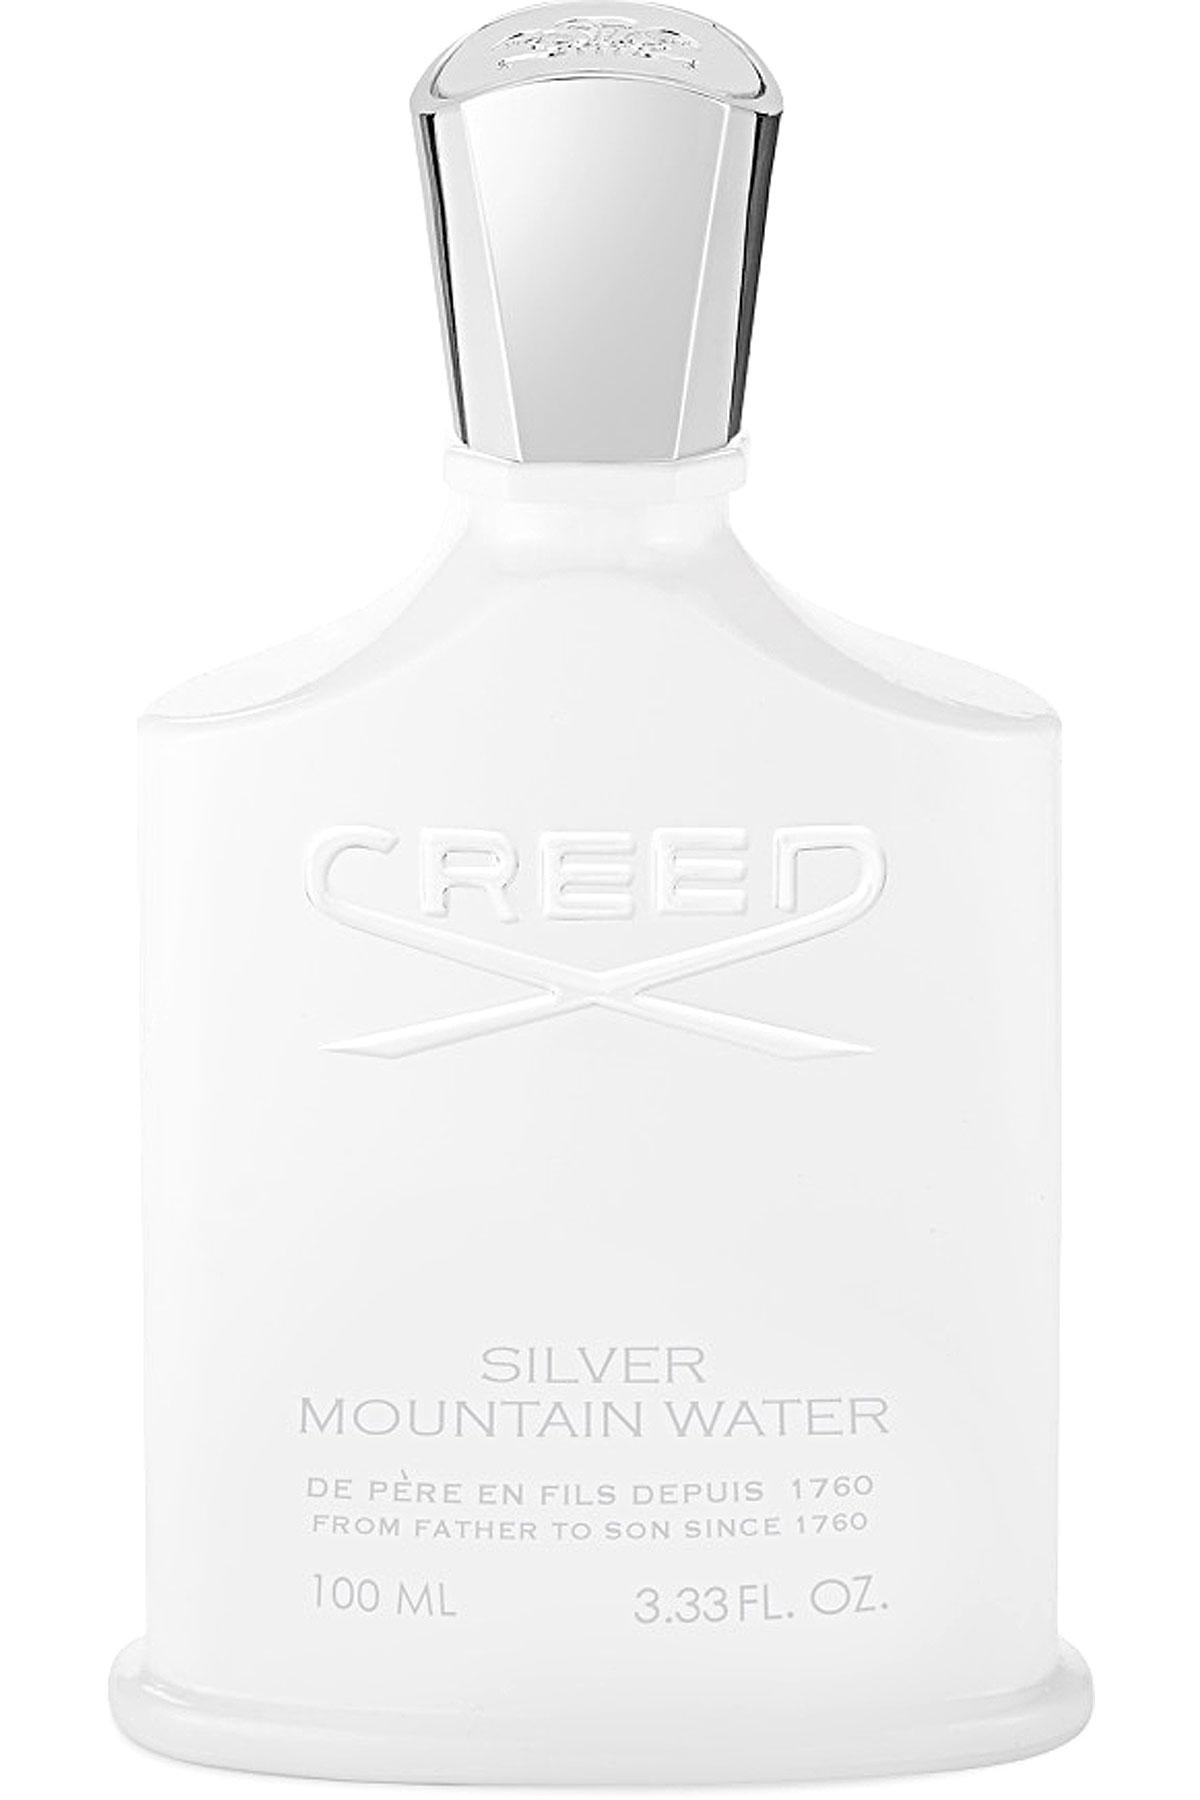 Creed Fragrances for Women, Silver Mountain Water - Eau De Parfum - 100 Ml, 2019, 100 ml